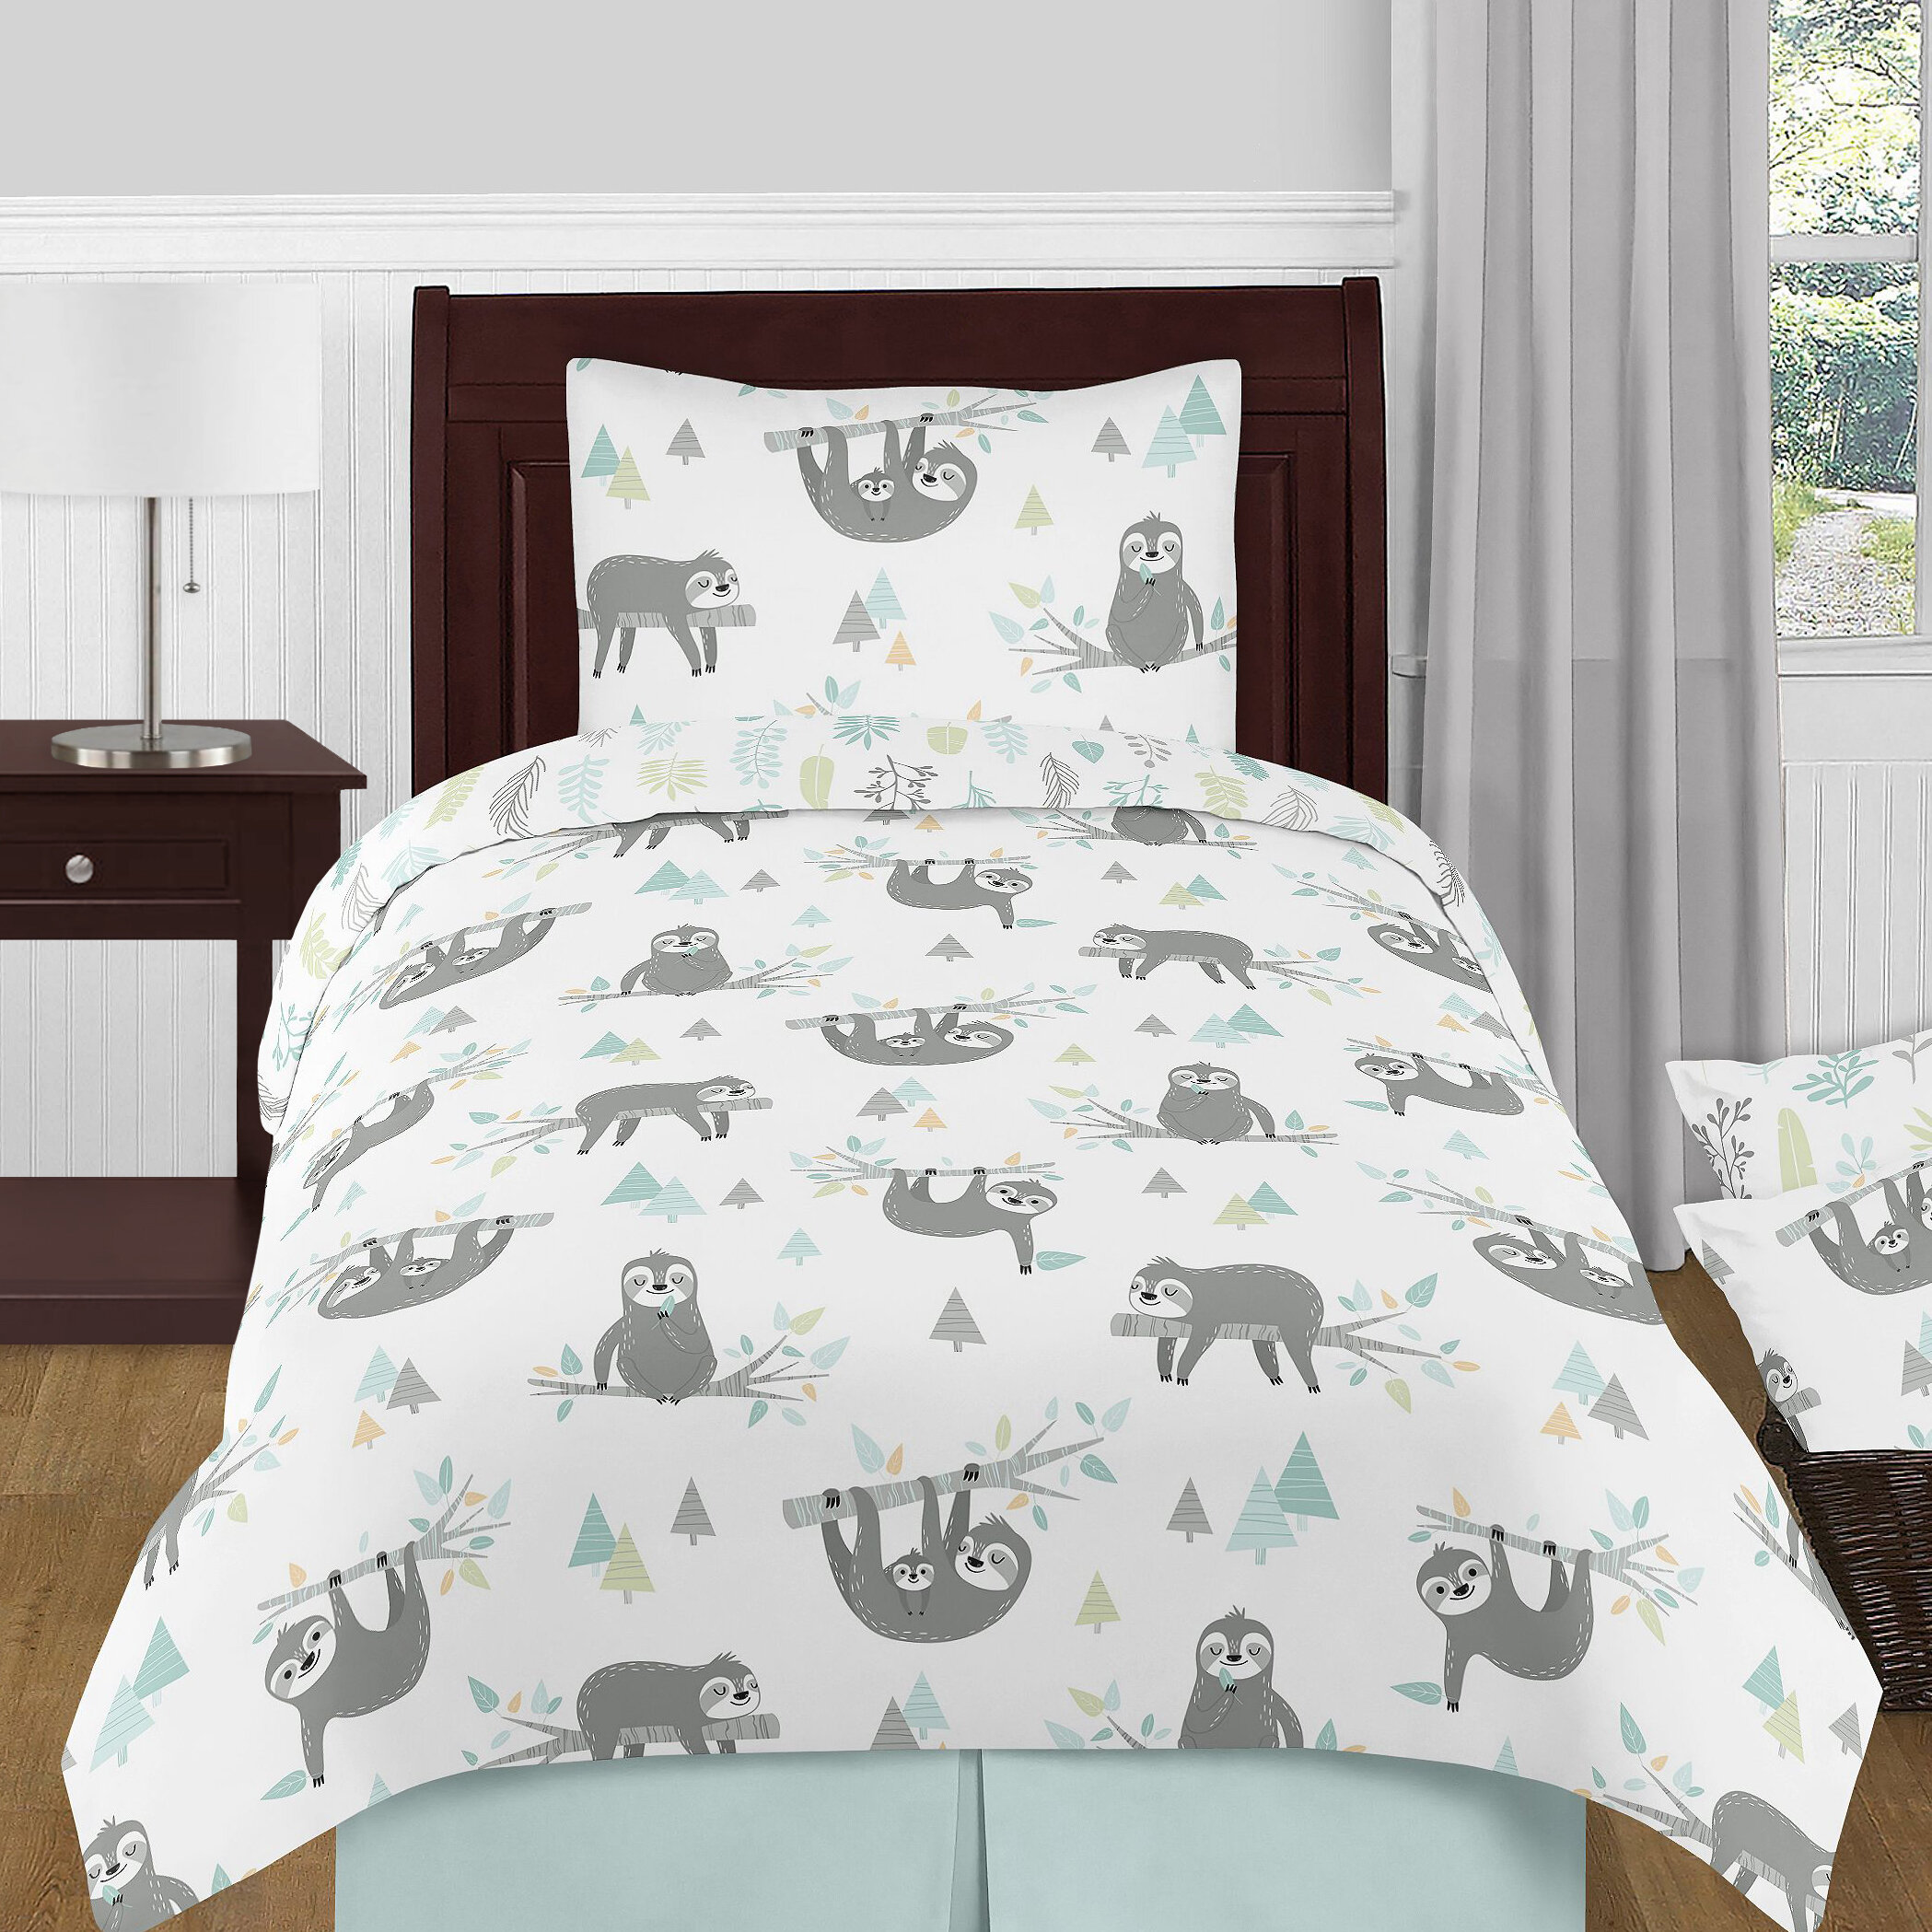 Sweet Jojo Designs Aqua And Grey Sloth Collection Sloth Comforter Set Wayfair Ca